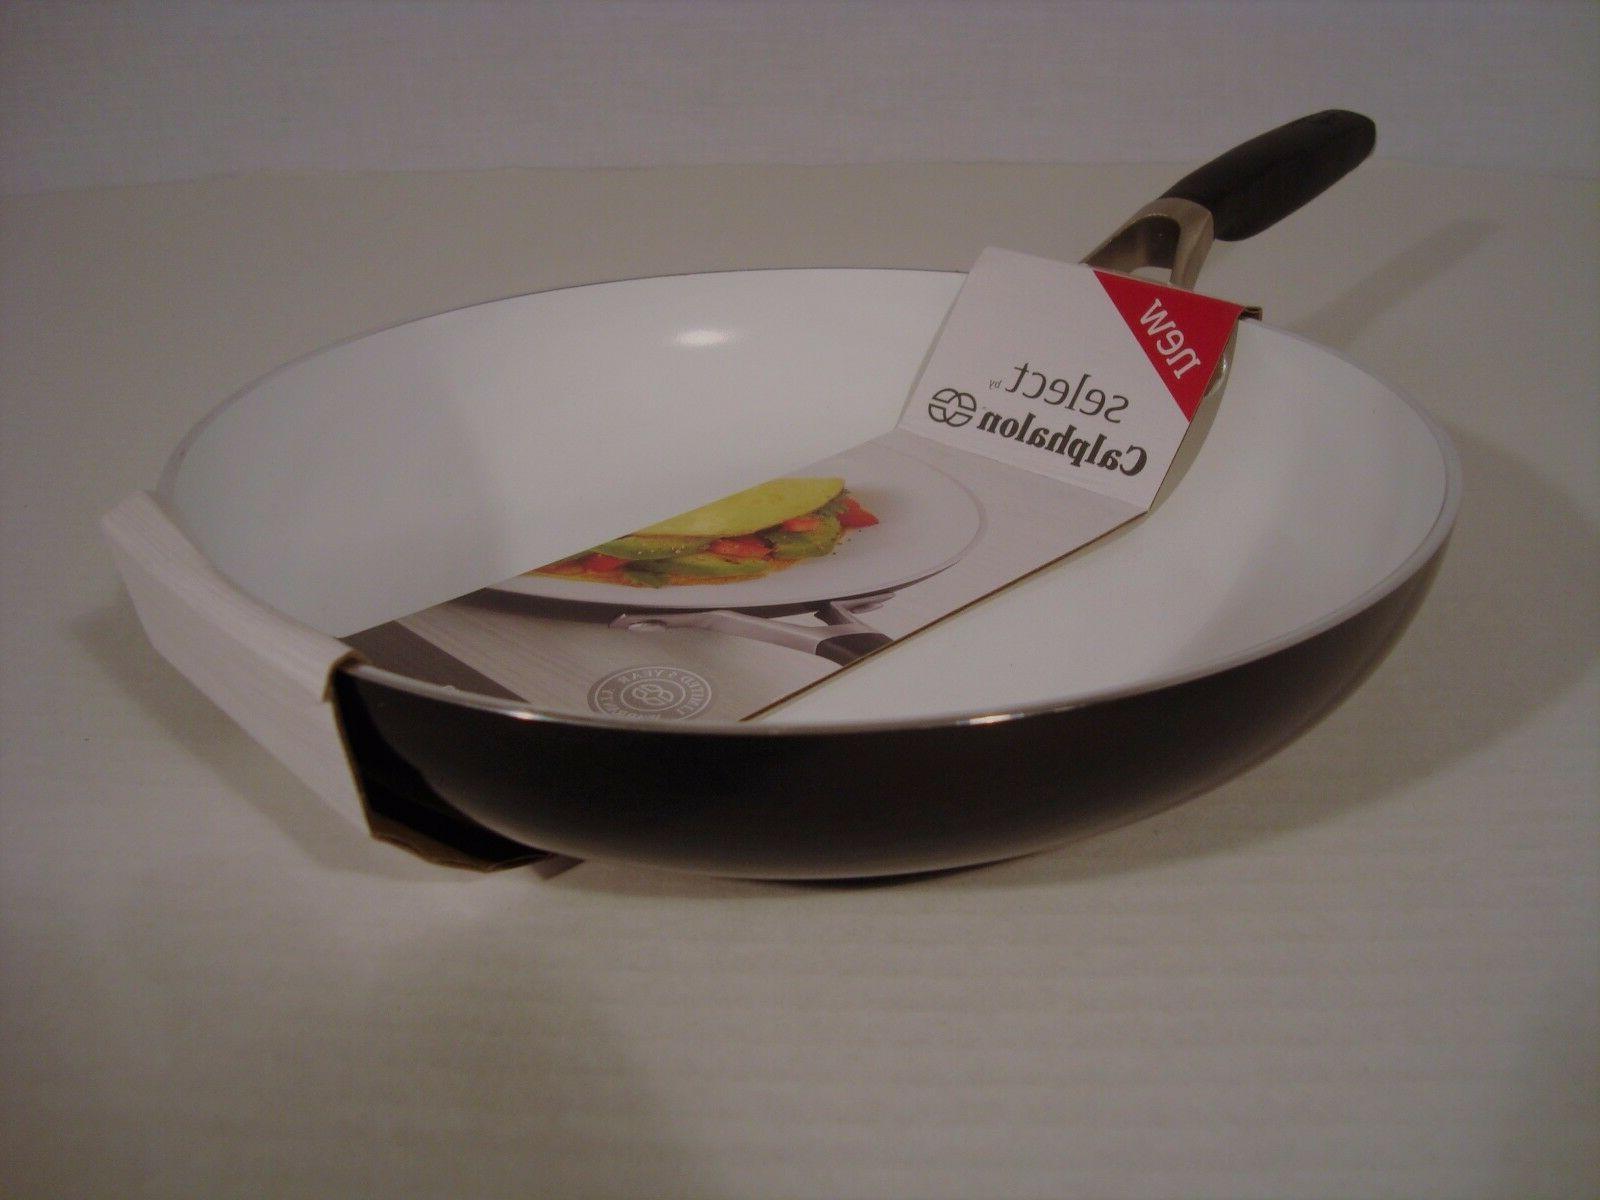 NEW Select Calphalon Ceramic Nonstick 10